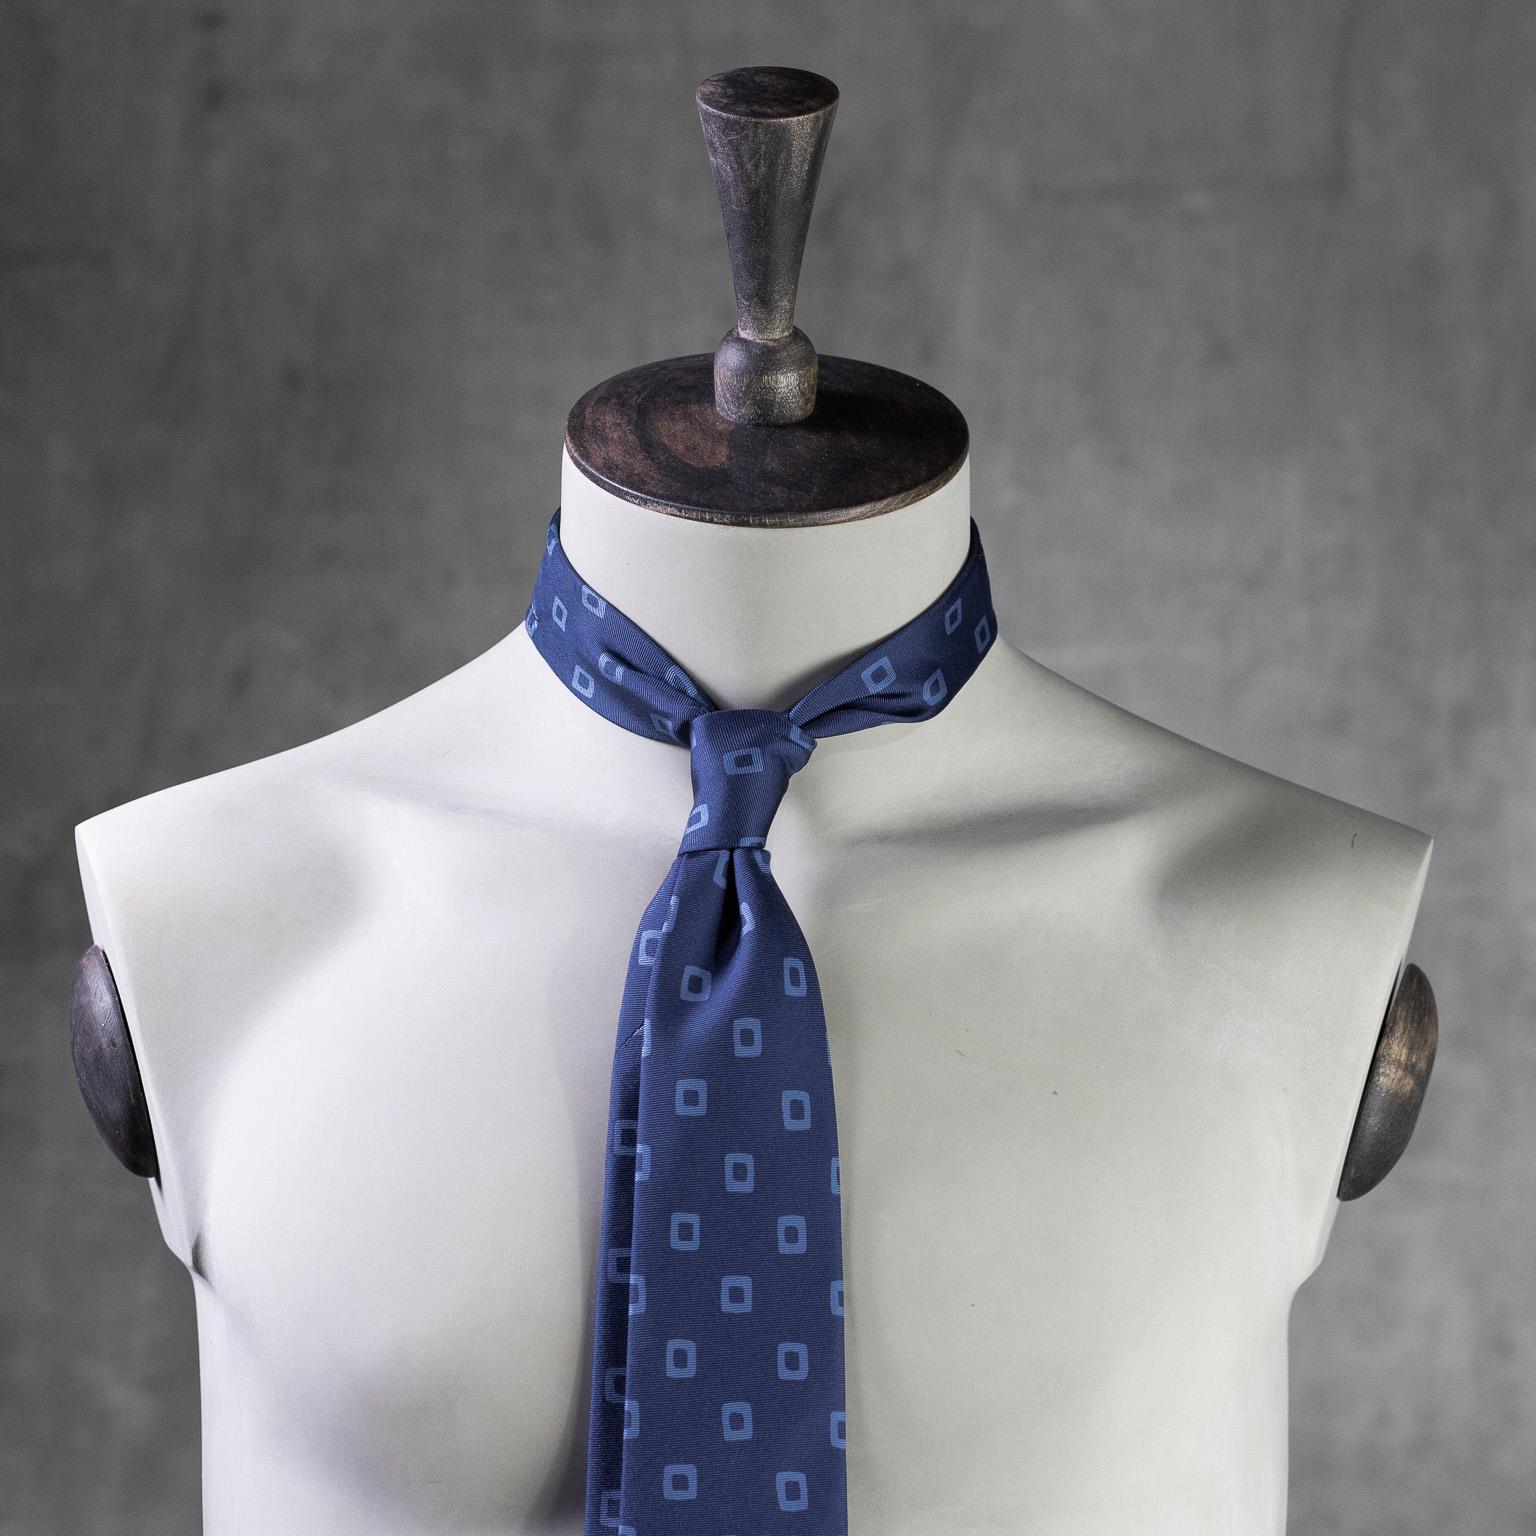 PRINTED-SILK-SEDA-ESTAMPADA-0570-Tie-Initials-Corbata-Iniciales-The-Seelk-2